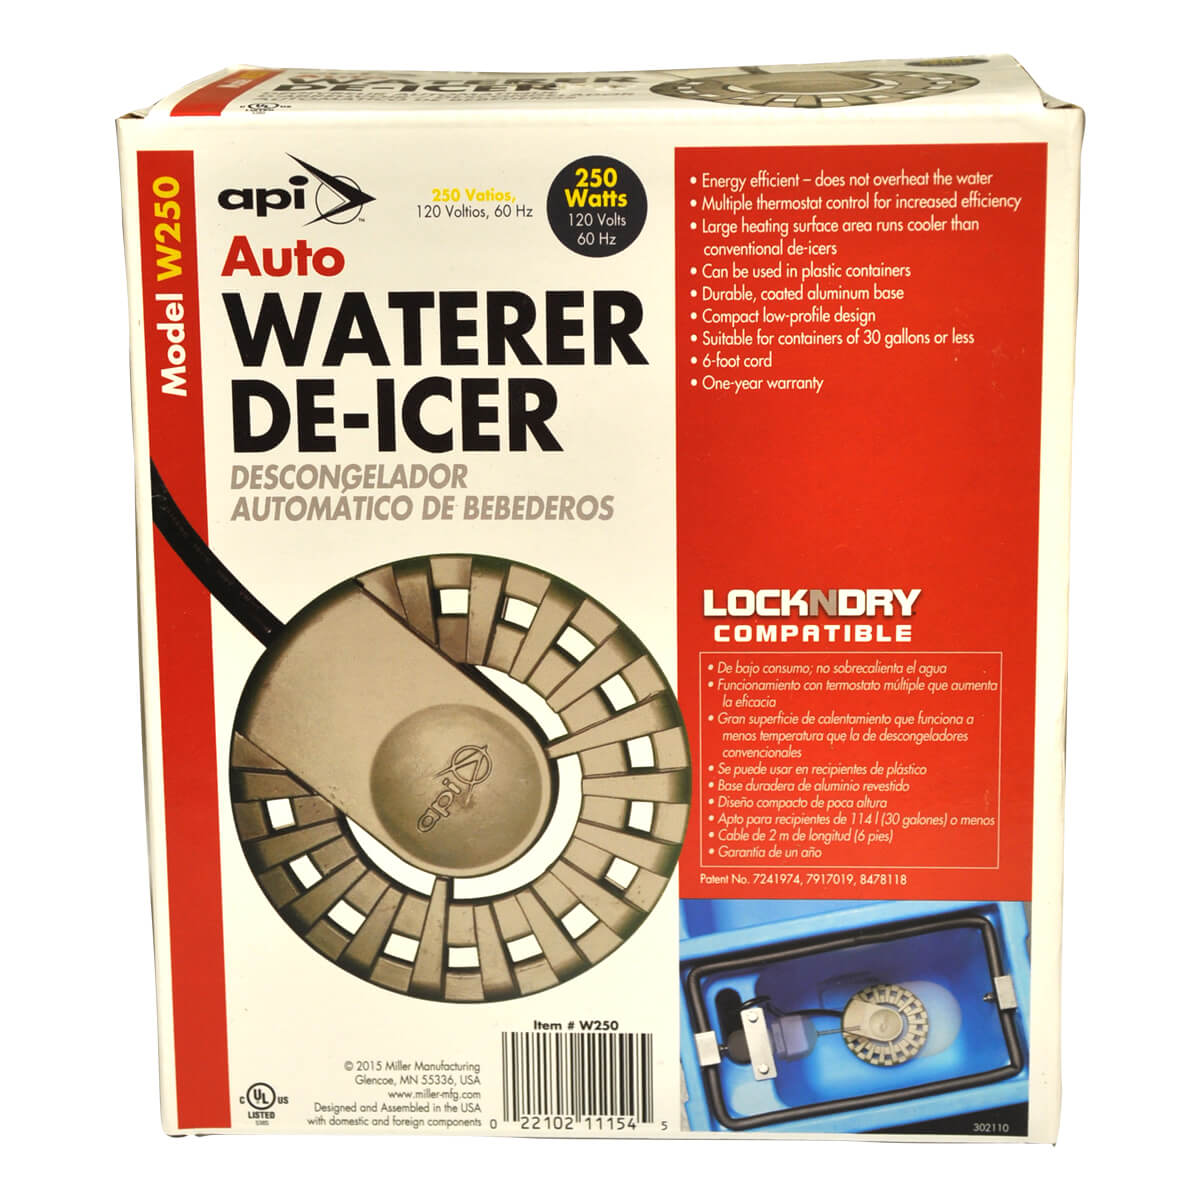 Auto Waterer De-Icer - 250W - 120V